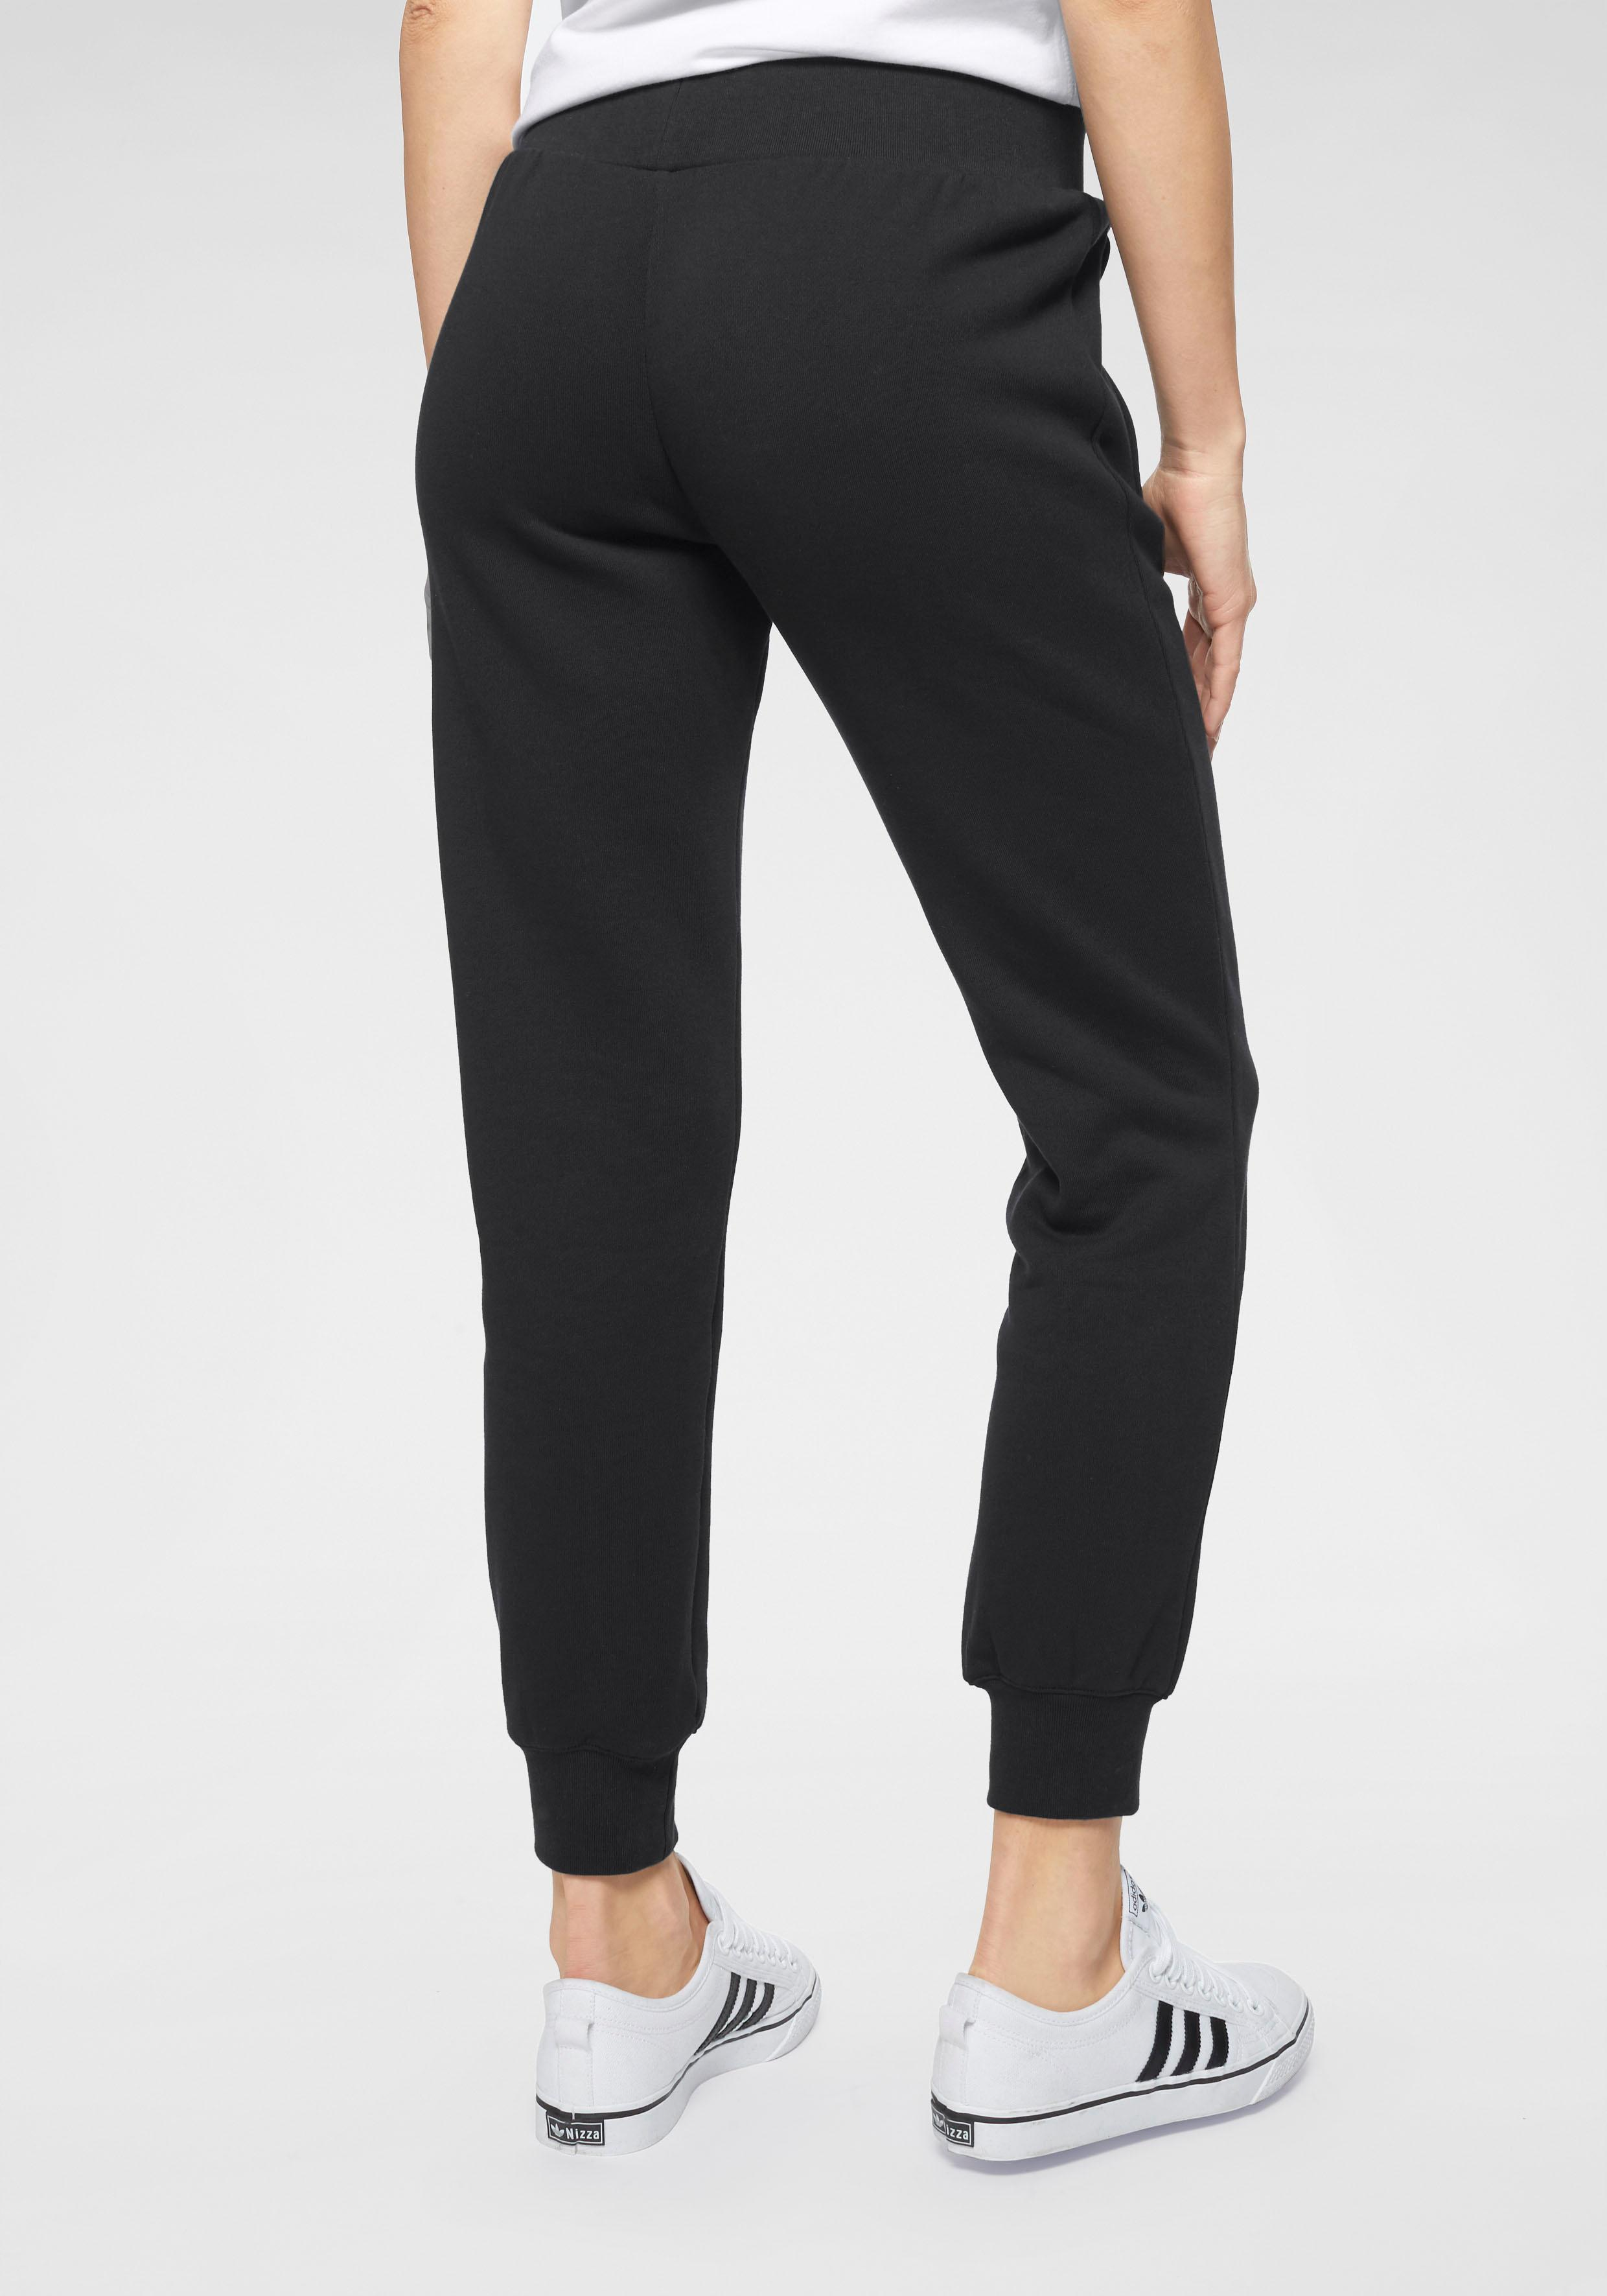 differently amazon wholesale adidas Originals Jogginghose »CUF PANT« bestellen | BAUR